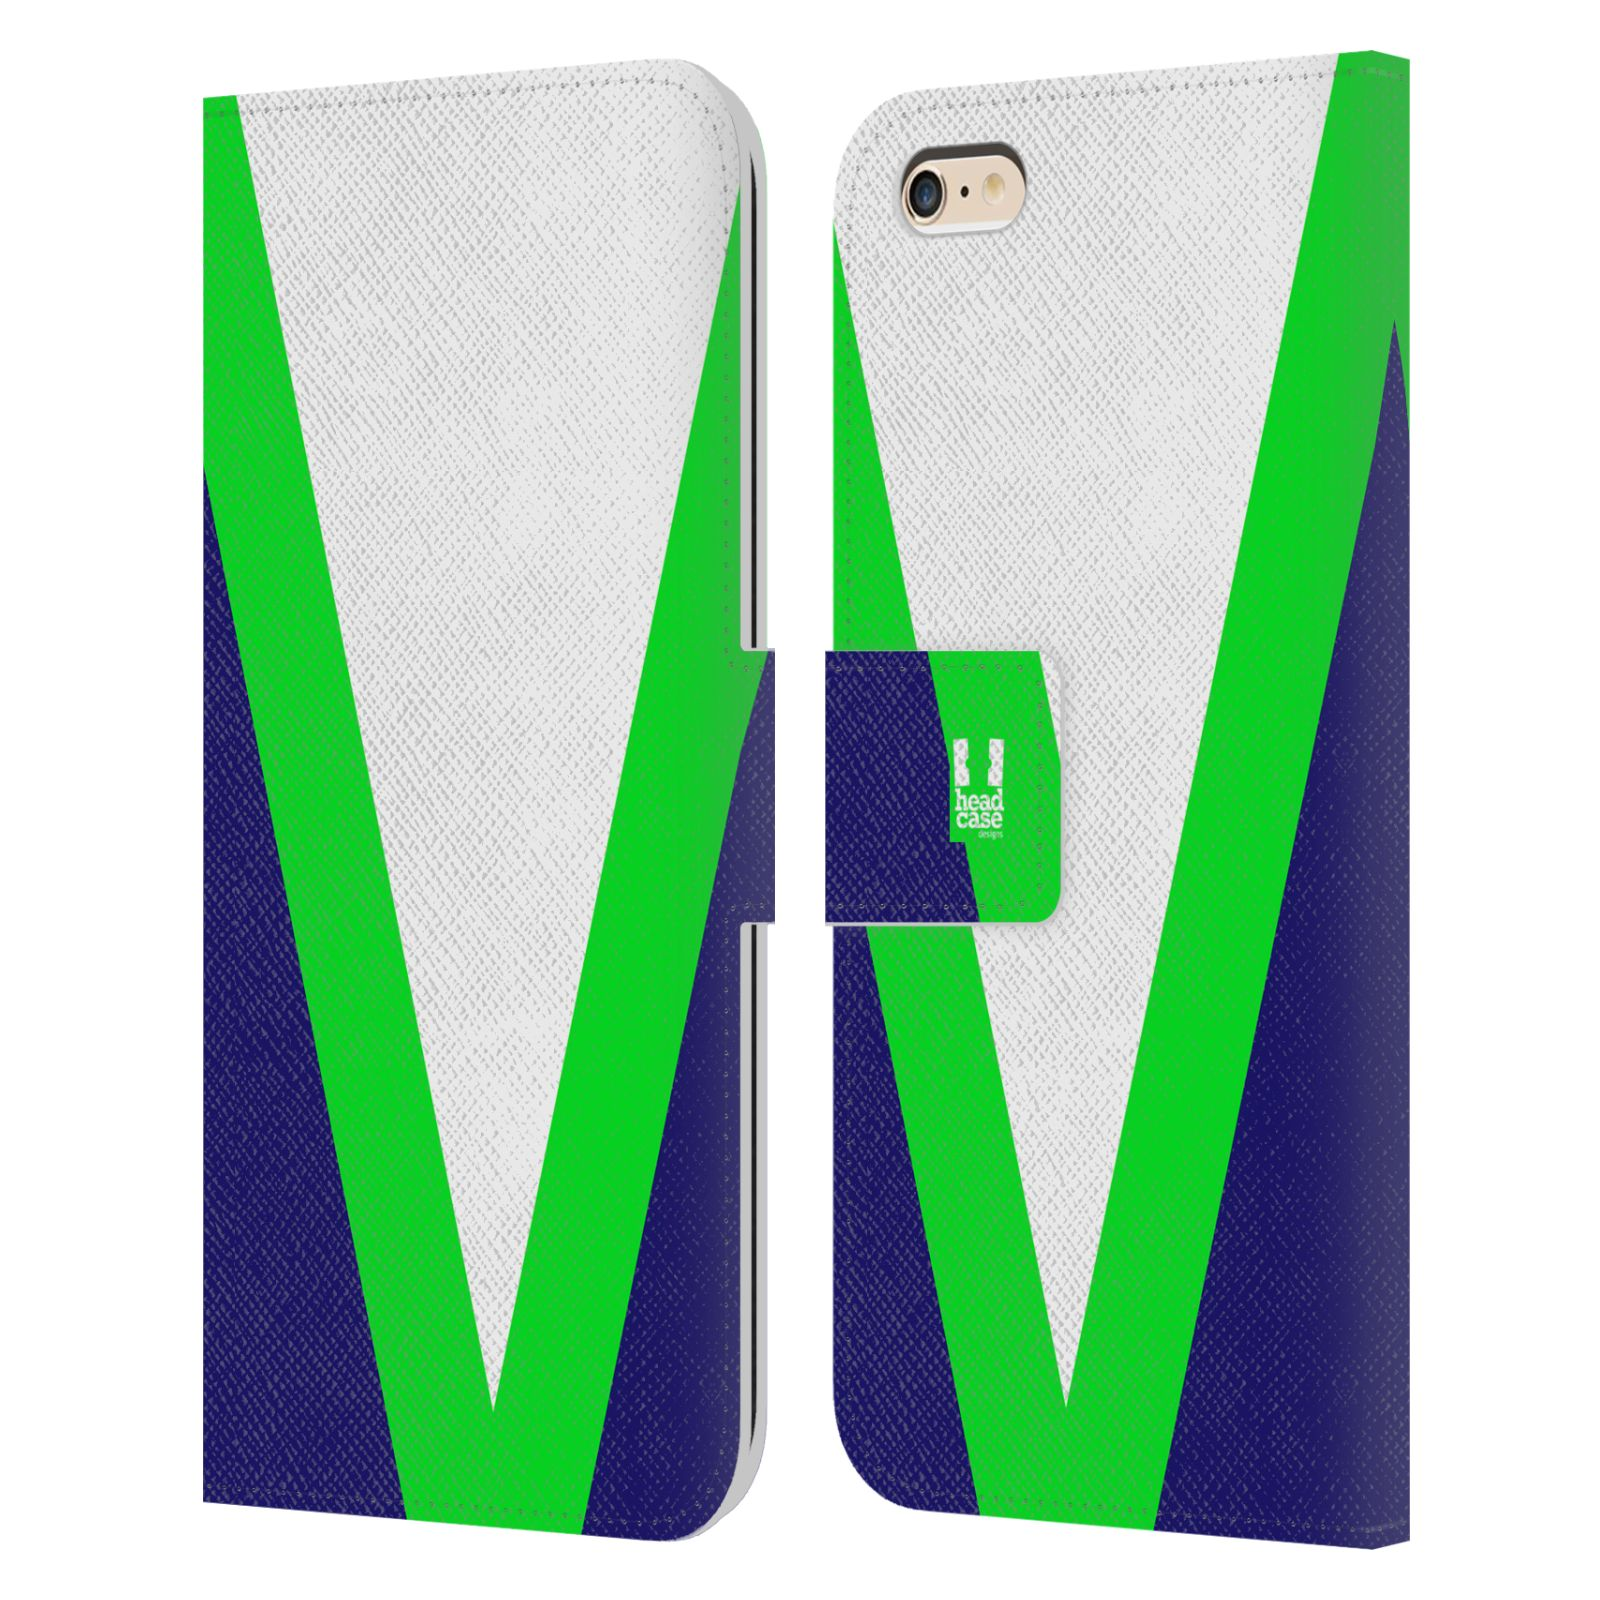 HEAD CASE Flipové pouzdro pro mobil Apple Iphone 6 PLUS/6S PLUS barevné tvary zelená a modrá